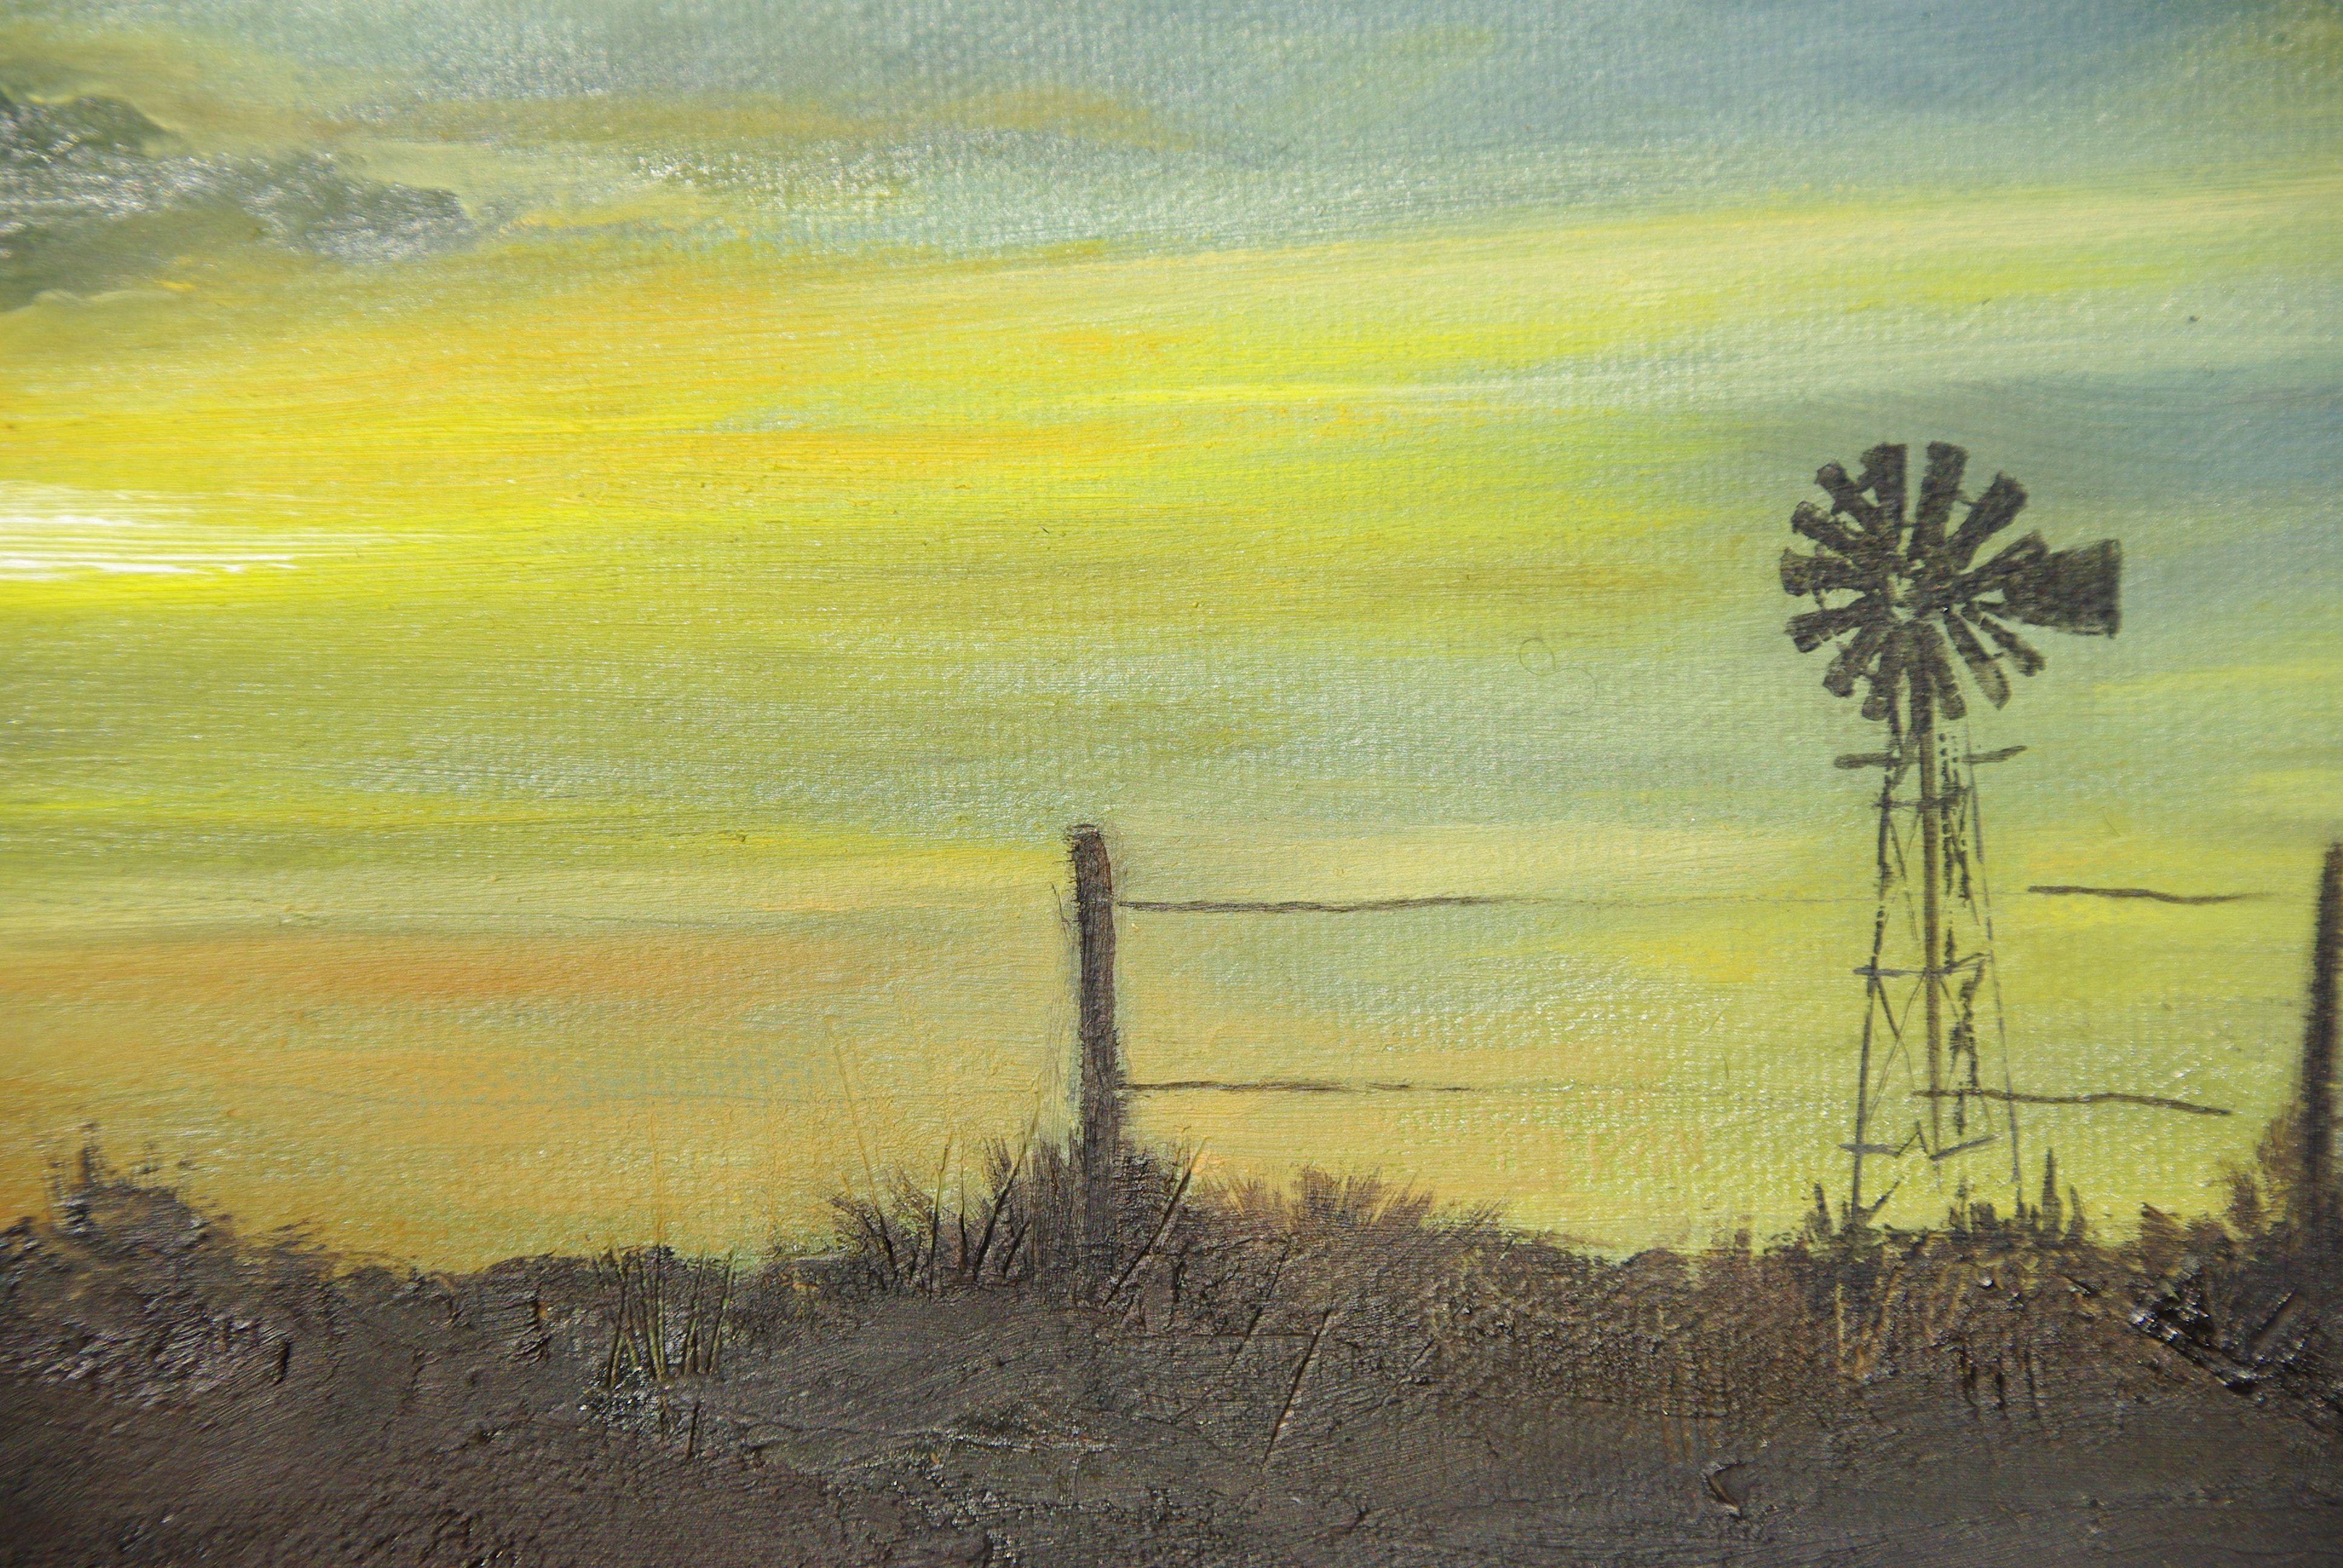 Windpomp sonsak Windpompe windmills Pinterest